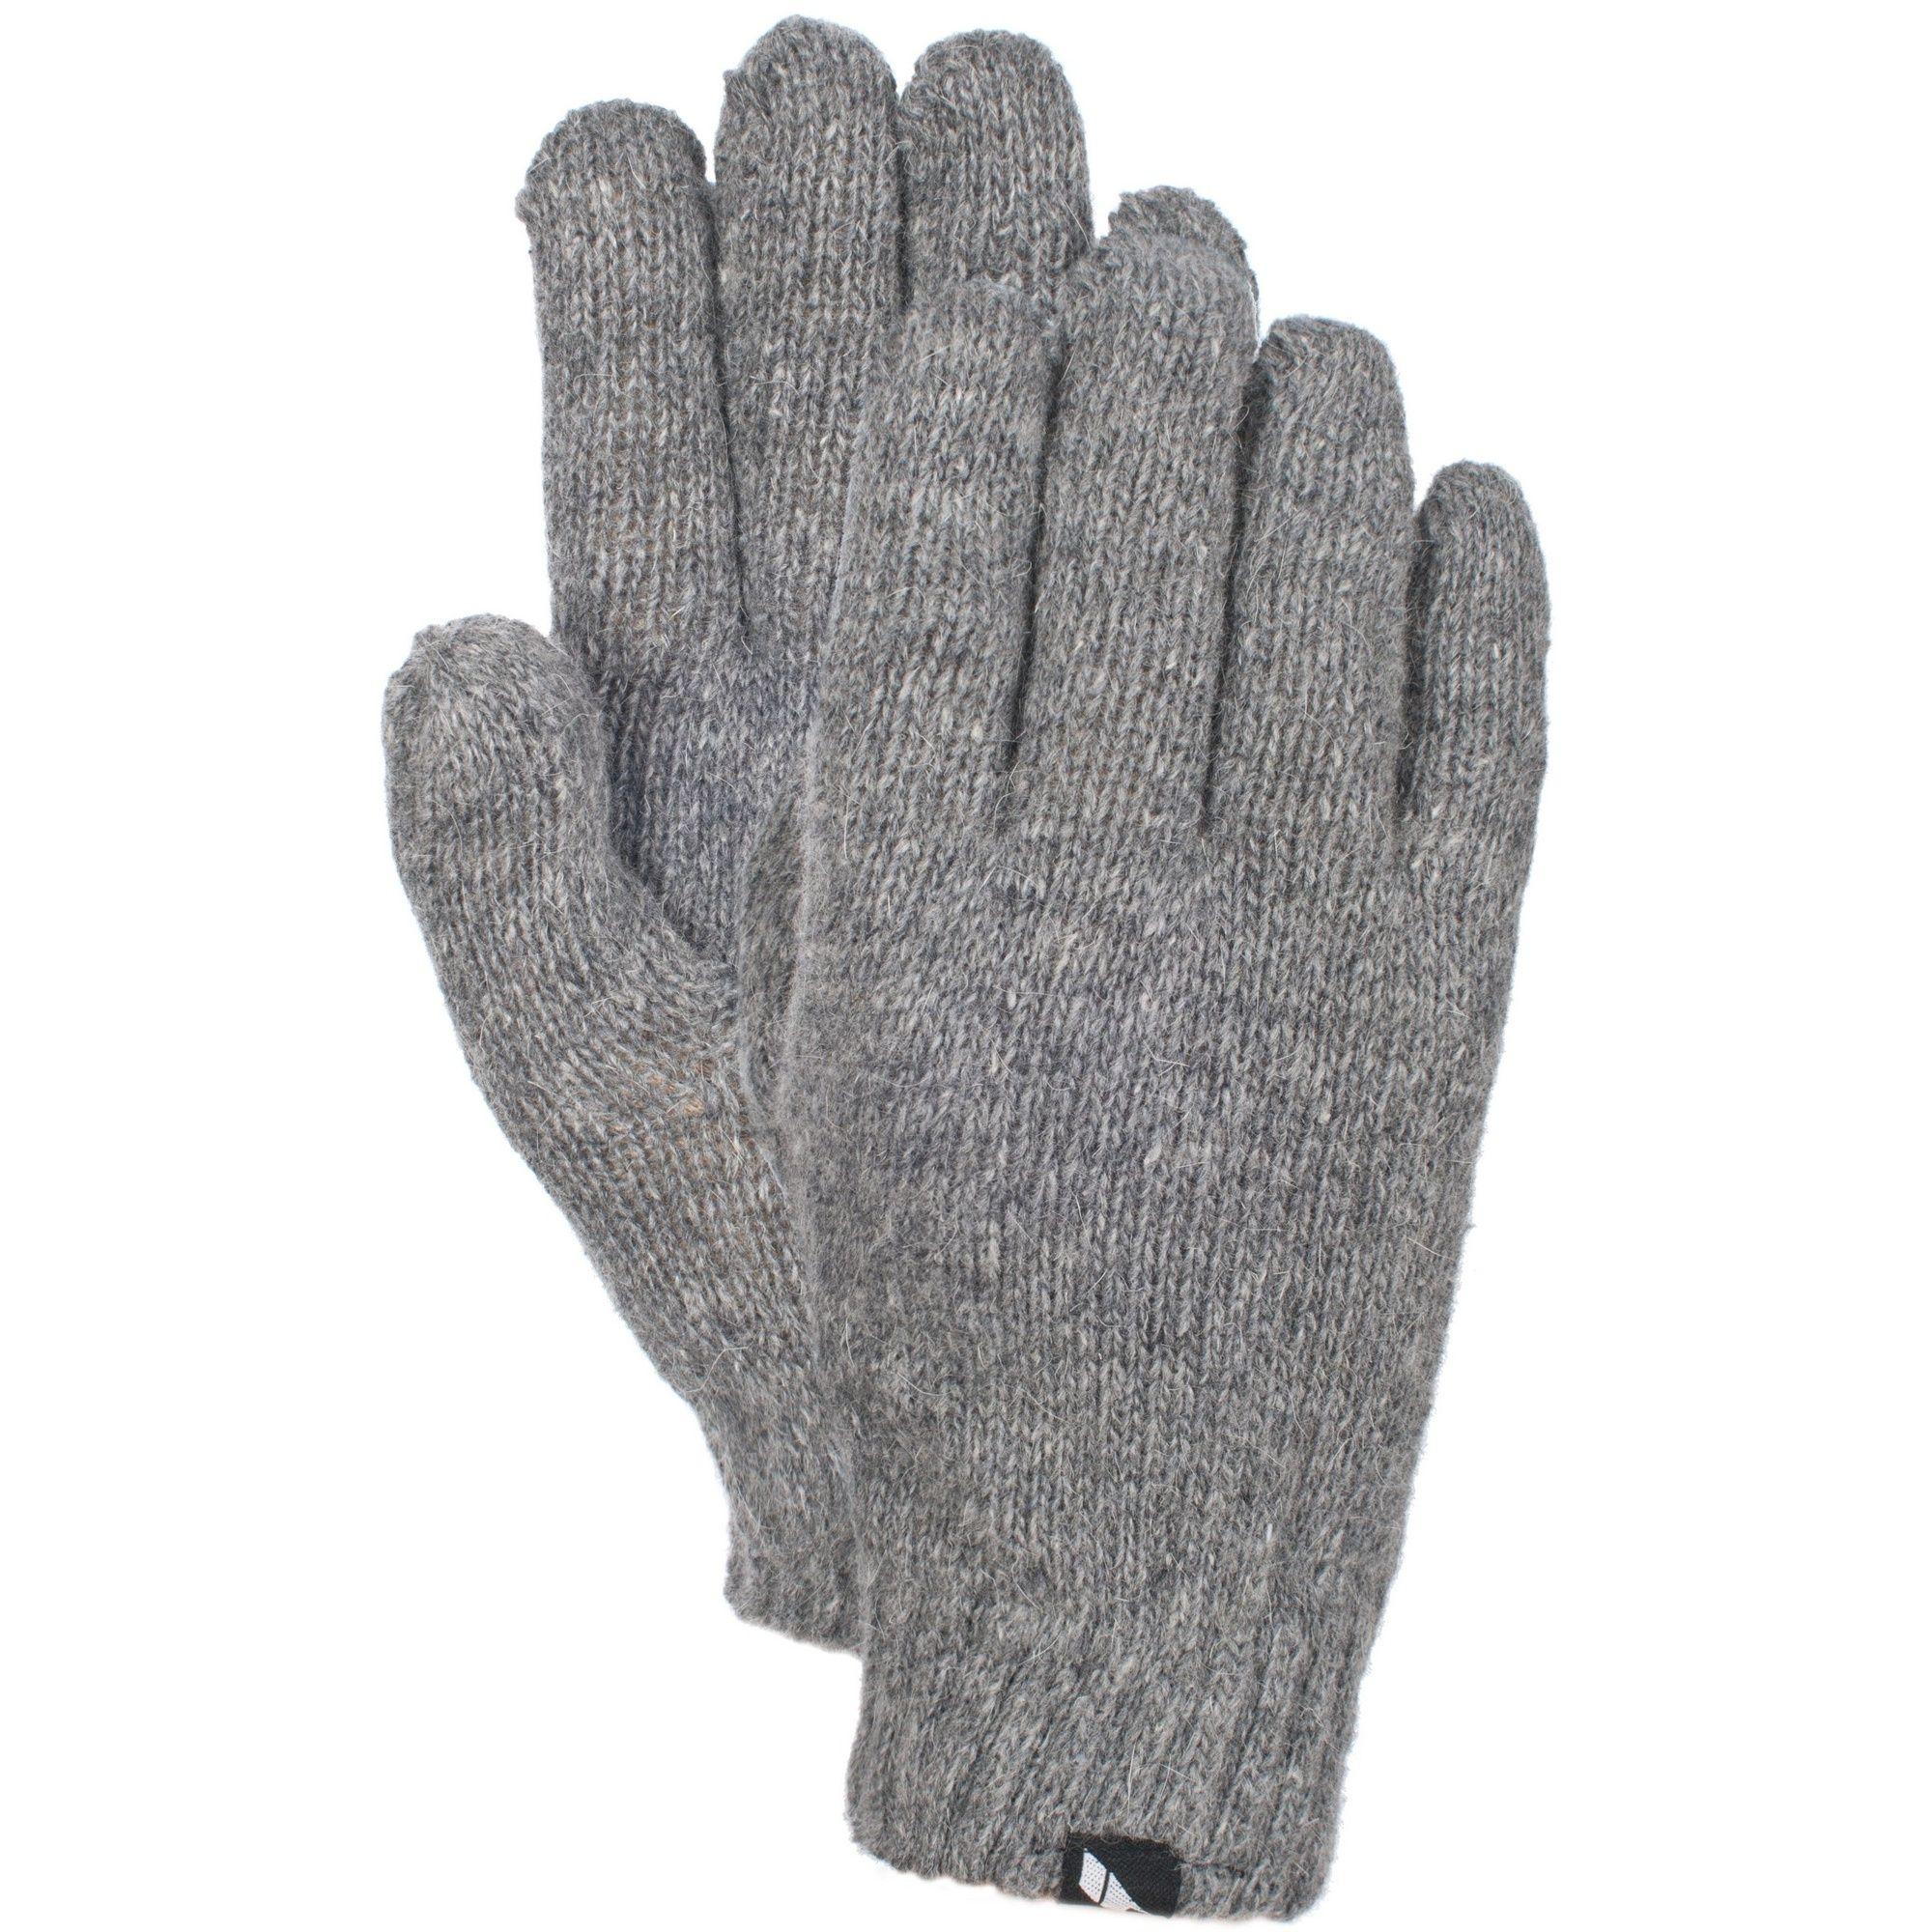 Trespass Women/Ladies Manicure Knitted Gloves